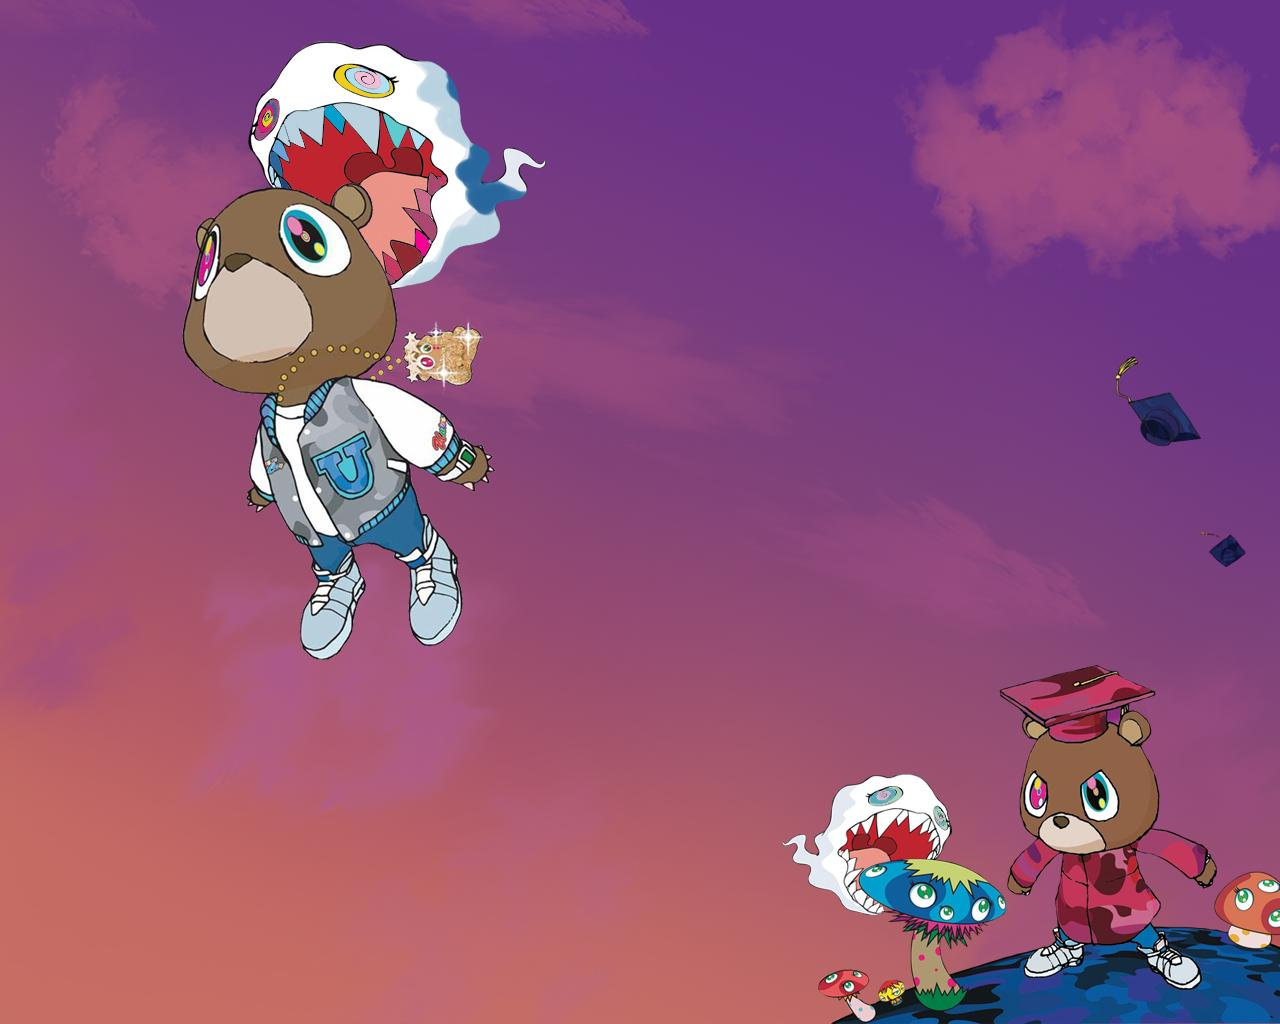 Kanye West Graduation Wallpapers